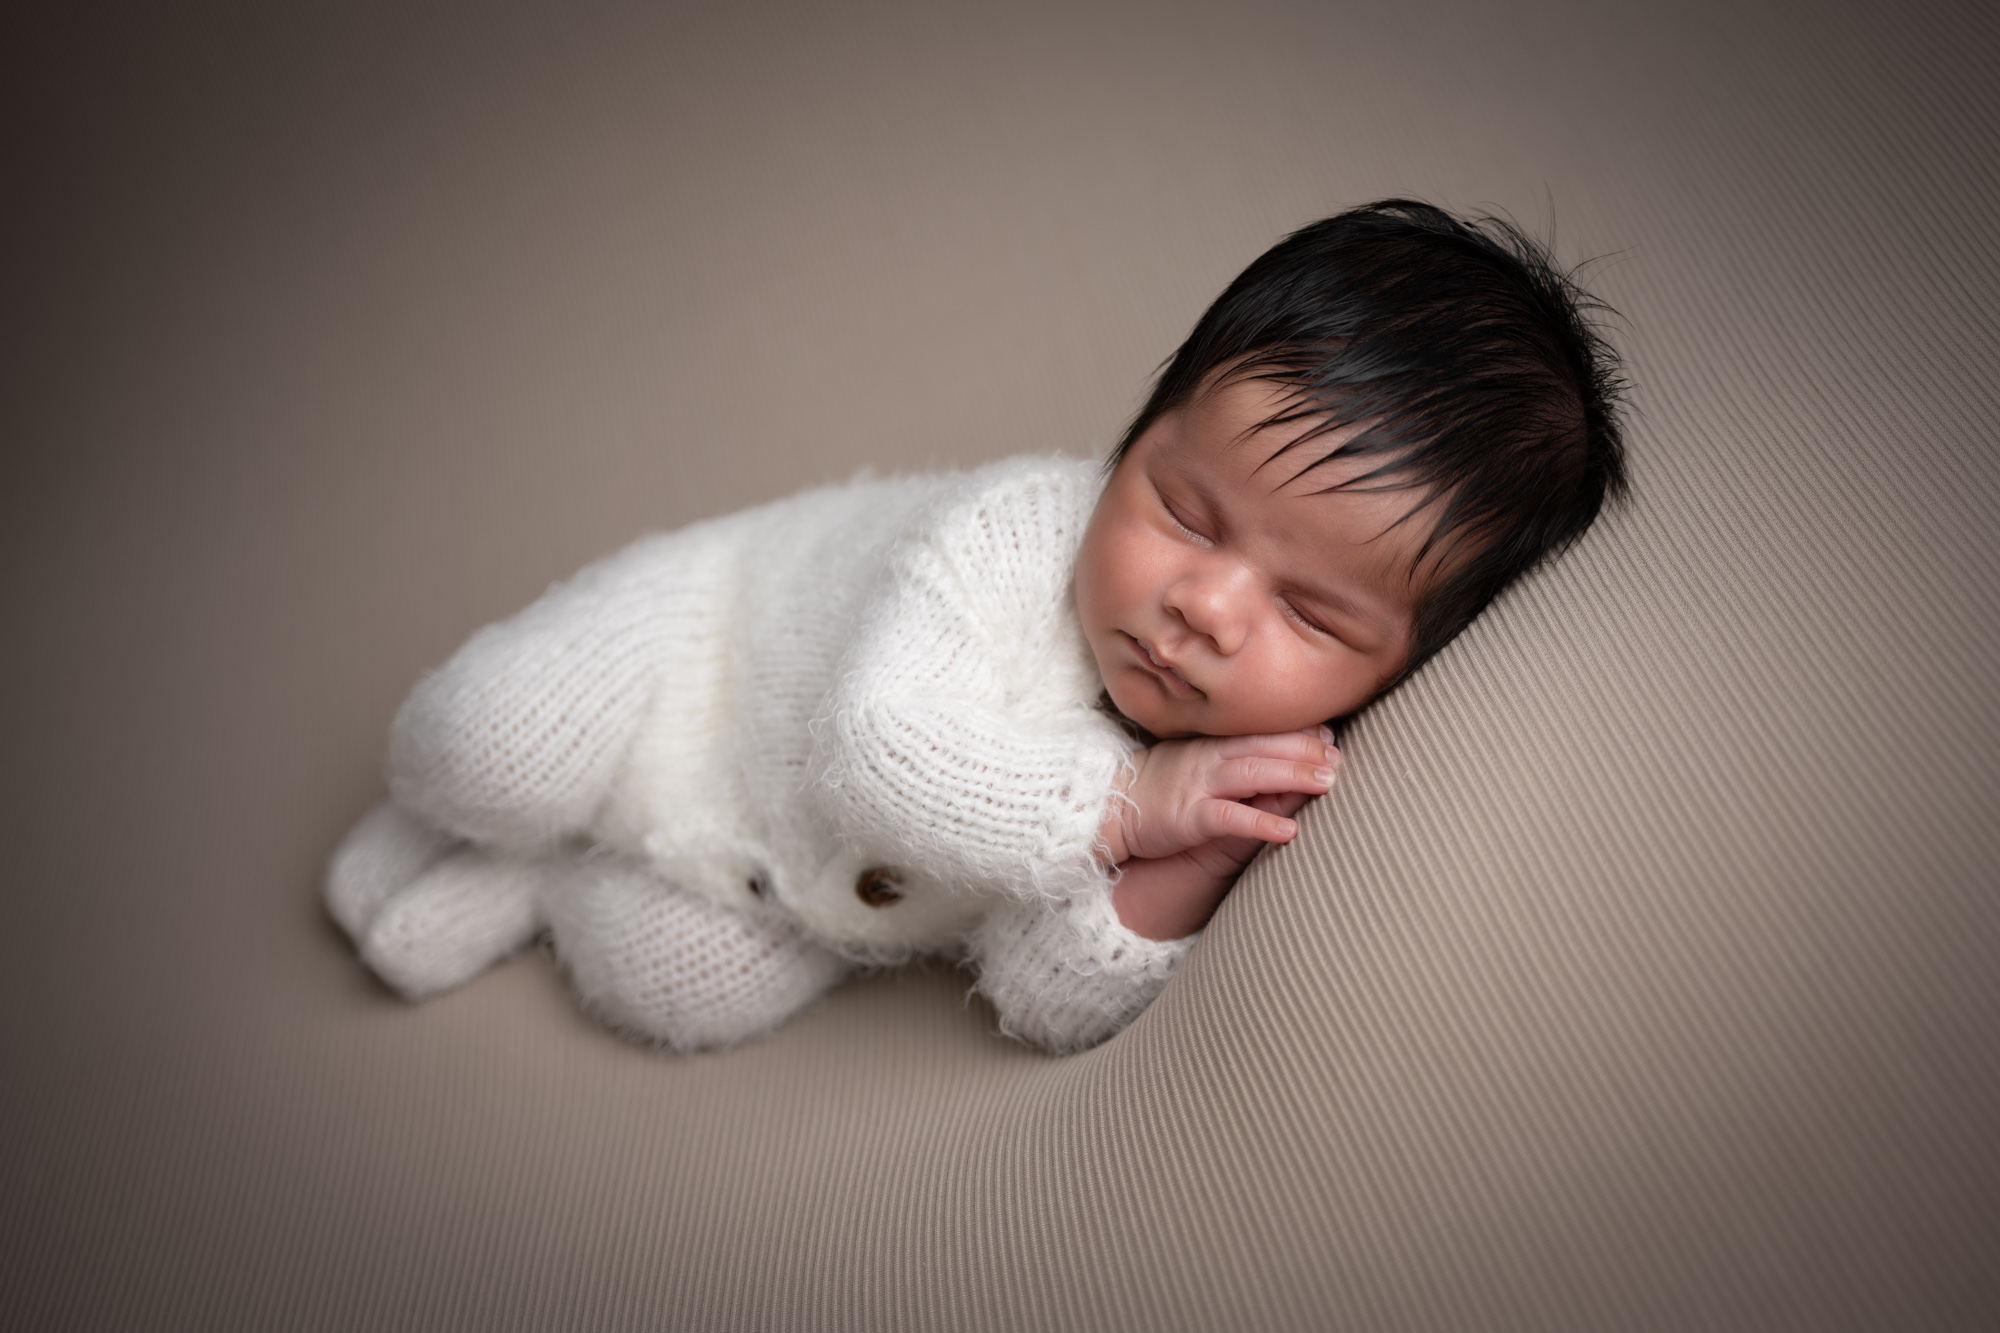 newborn_baby_photographer_dudley_midlands_posing_in_wrap